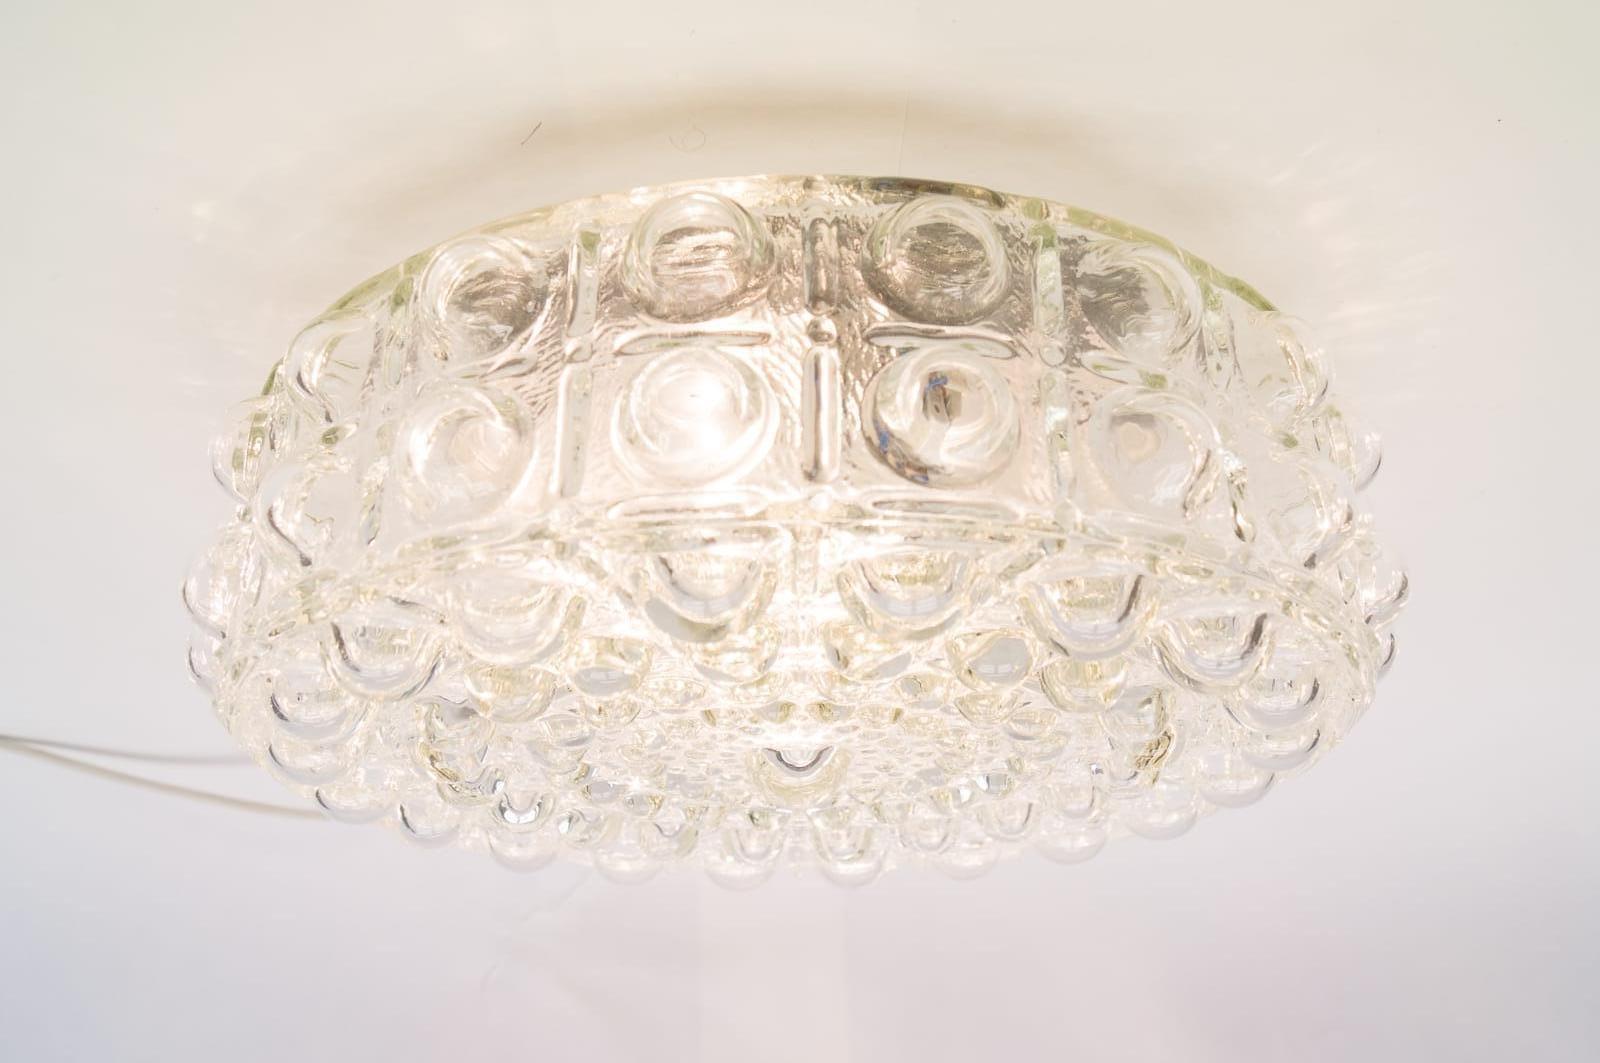 Grande lampe de bureau en verre bull 1960s en vente sur pamono - Grande lampe a bulle ...